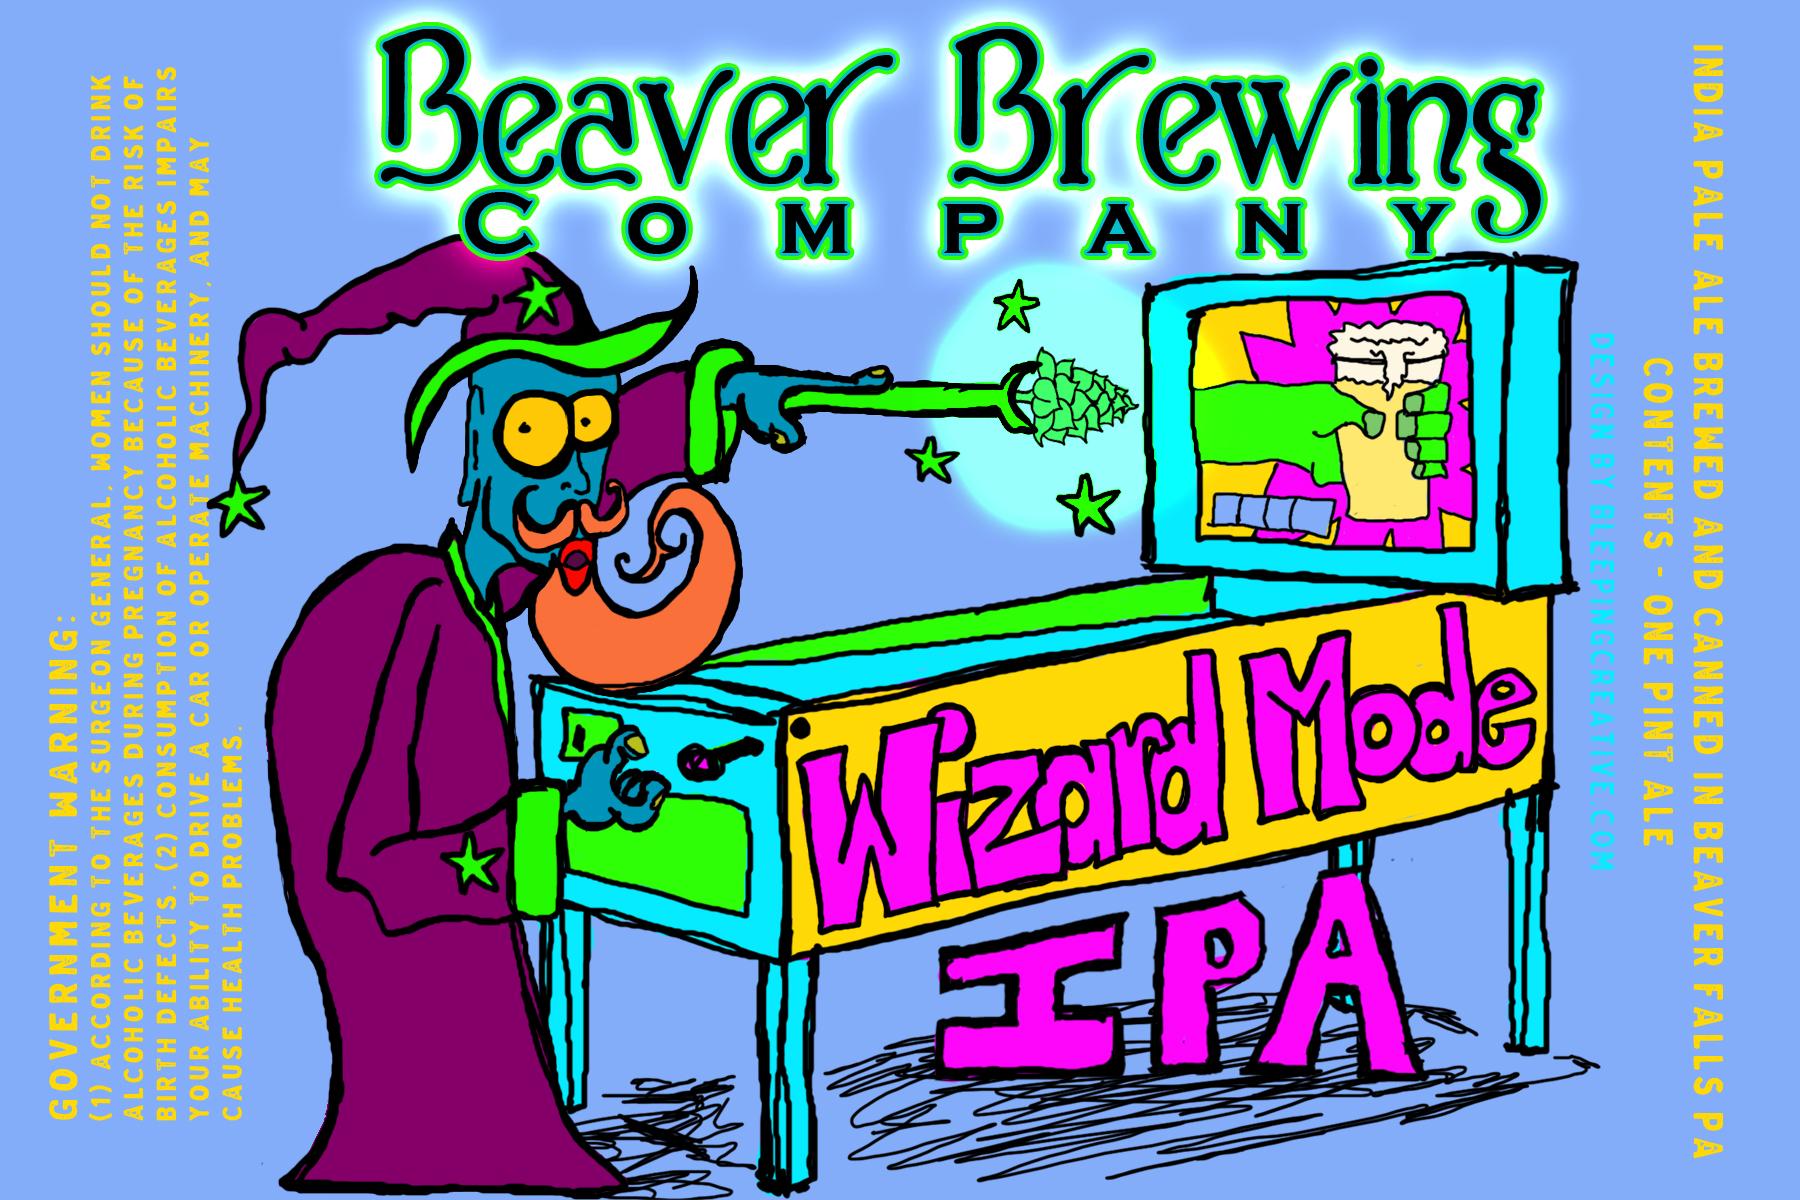 Beaver Beer Company